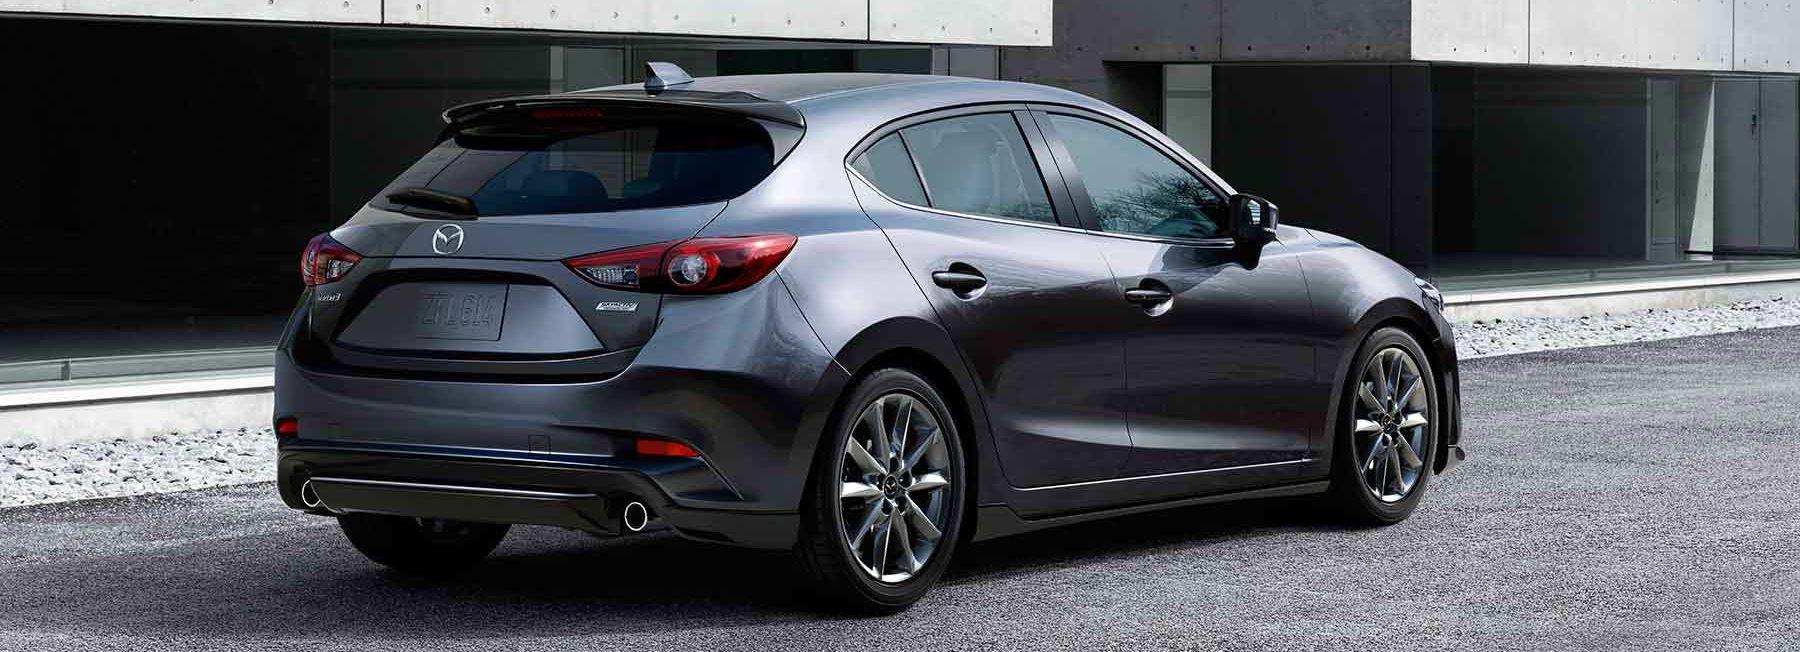 2017 Mazda3 for Sale near Kalamazoo, MI - Basney Mazda